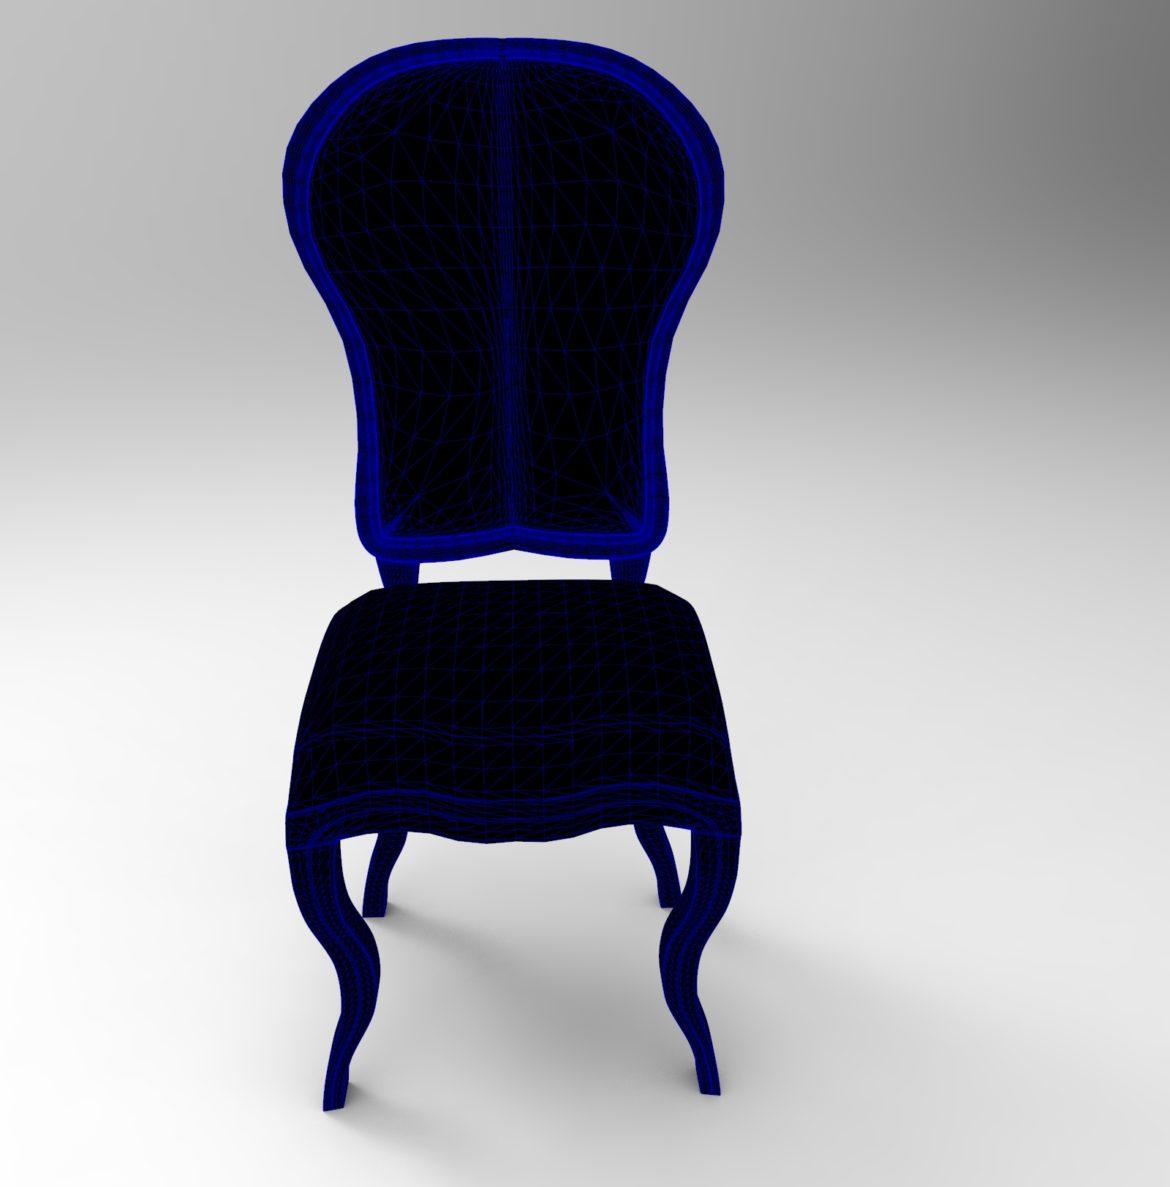 chair chapender-7 3d model max obj 295878